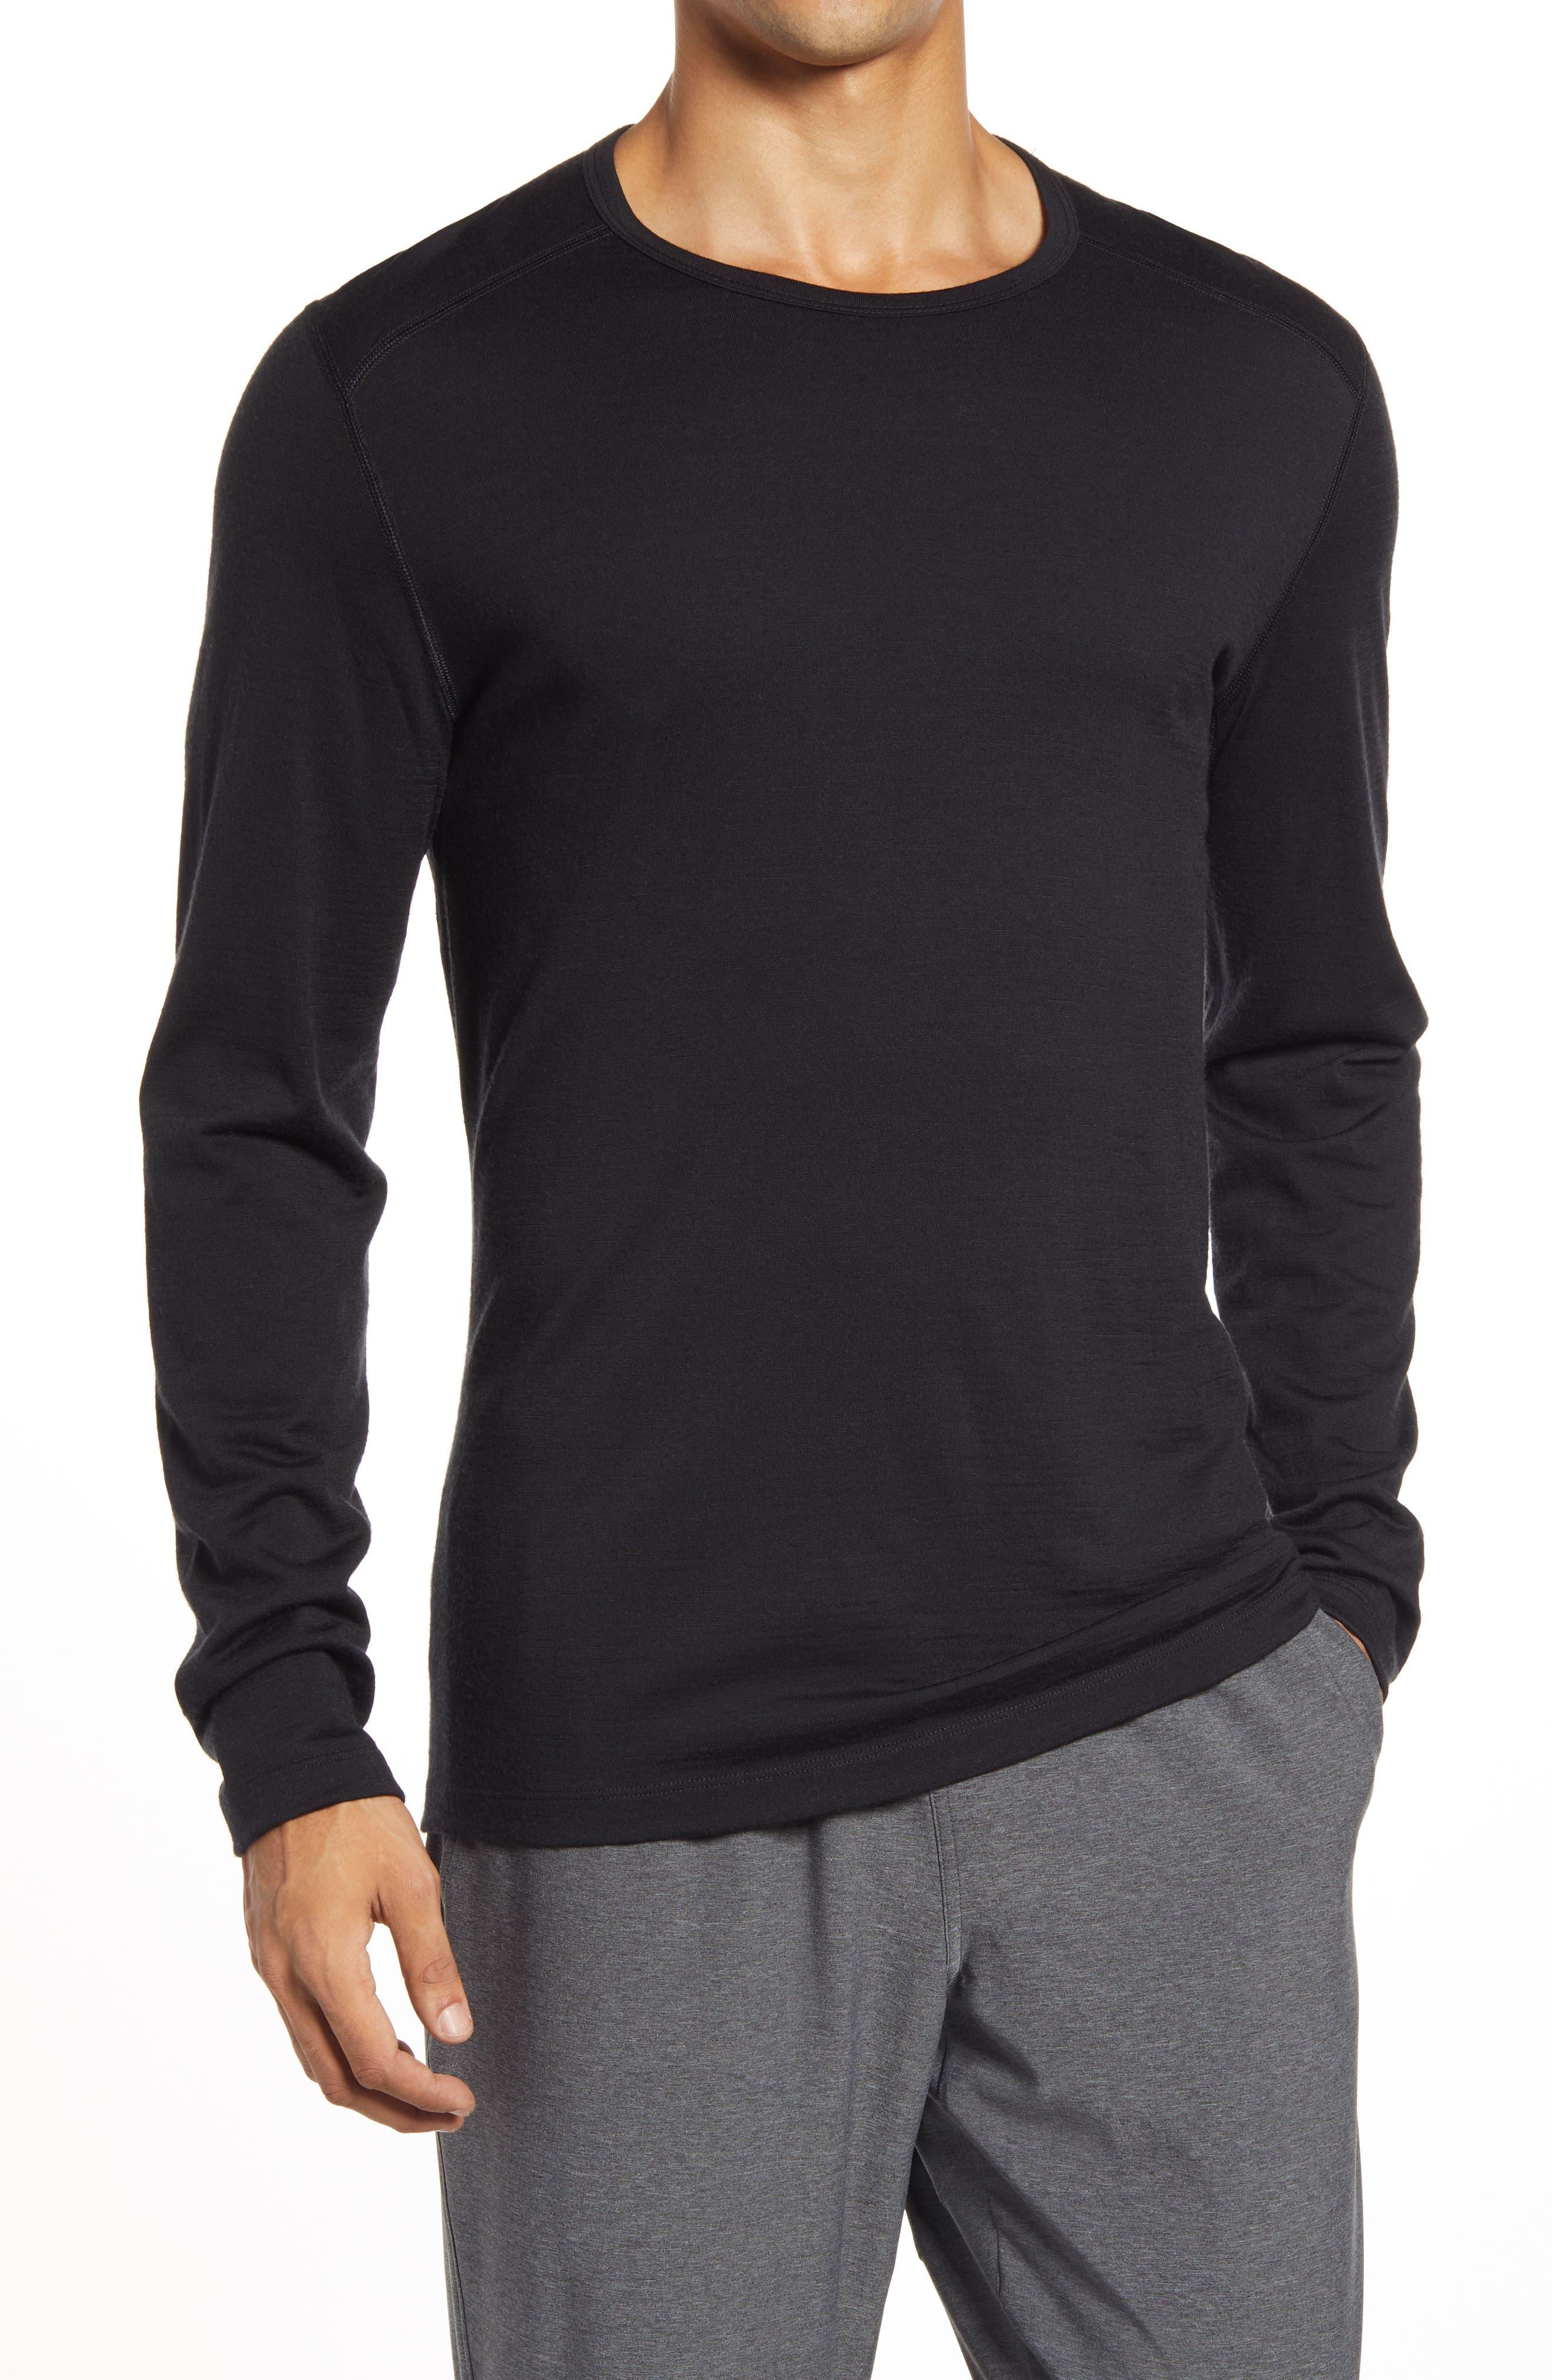 Oasis Long Sleeve Merino Wool Base Layer T-Shirt